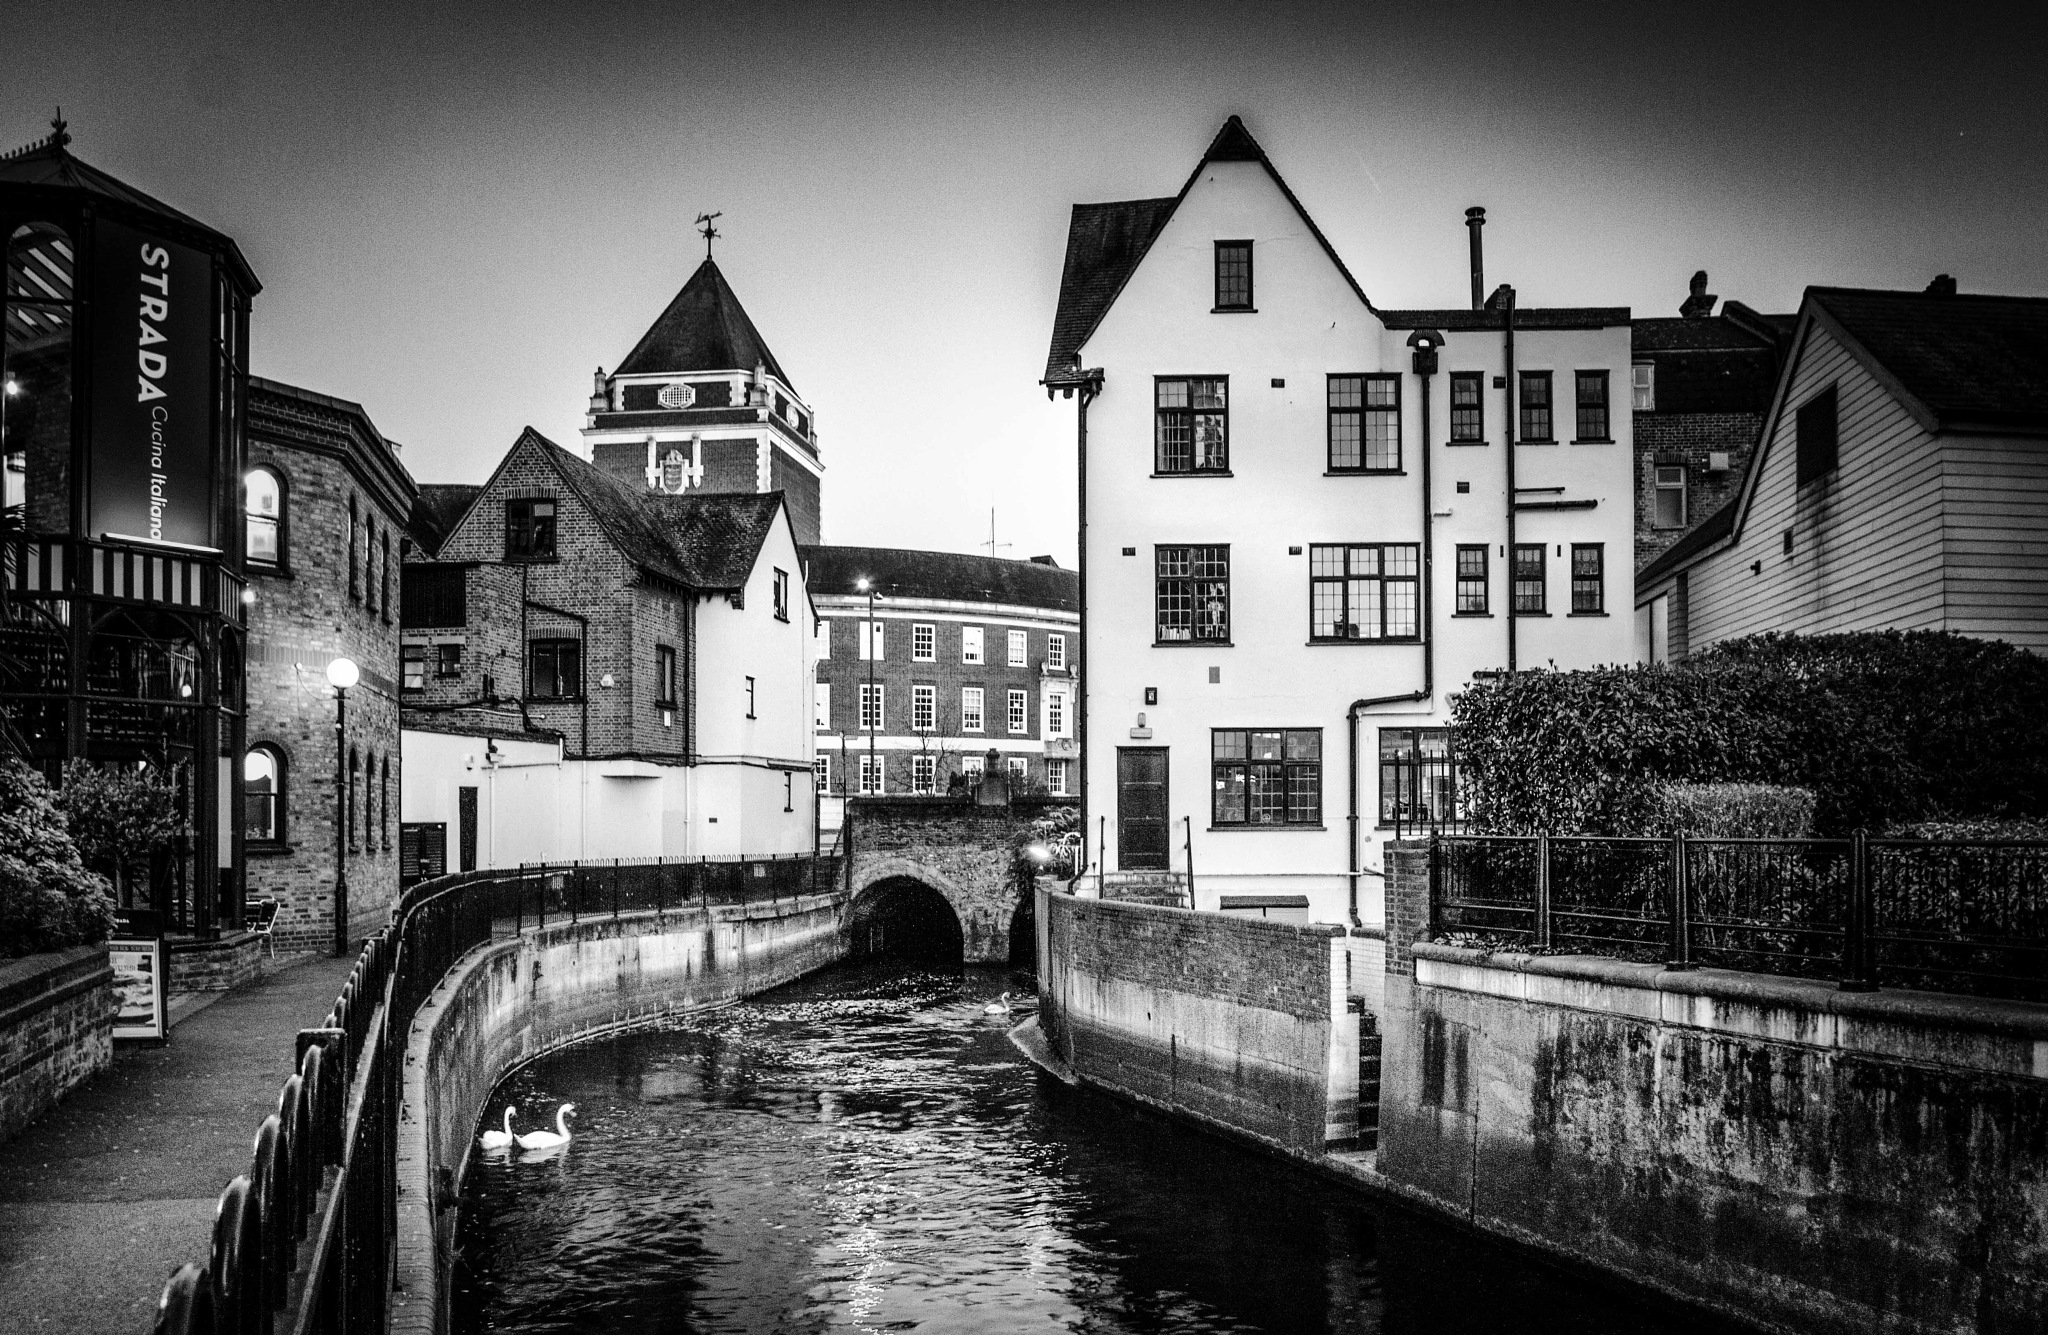 City... by Przemek Sliwinski (crazyofl)